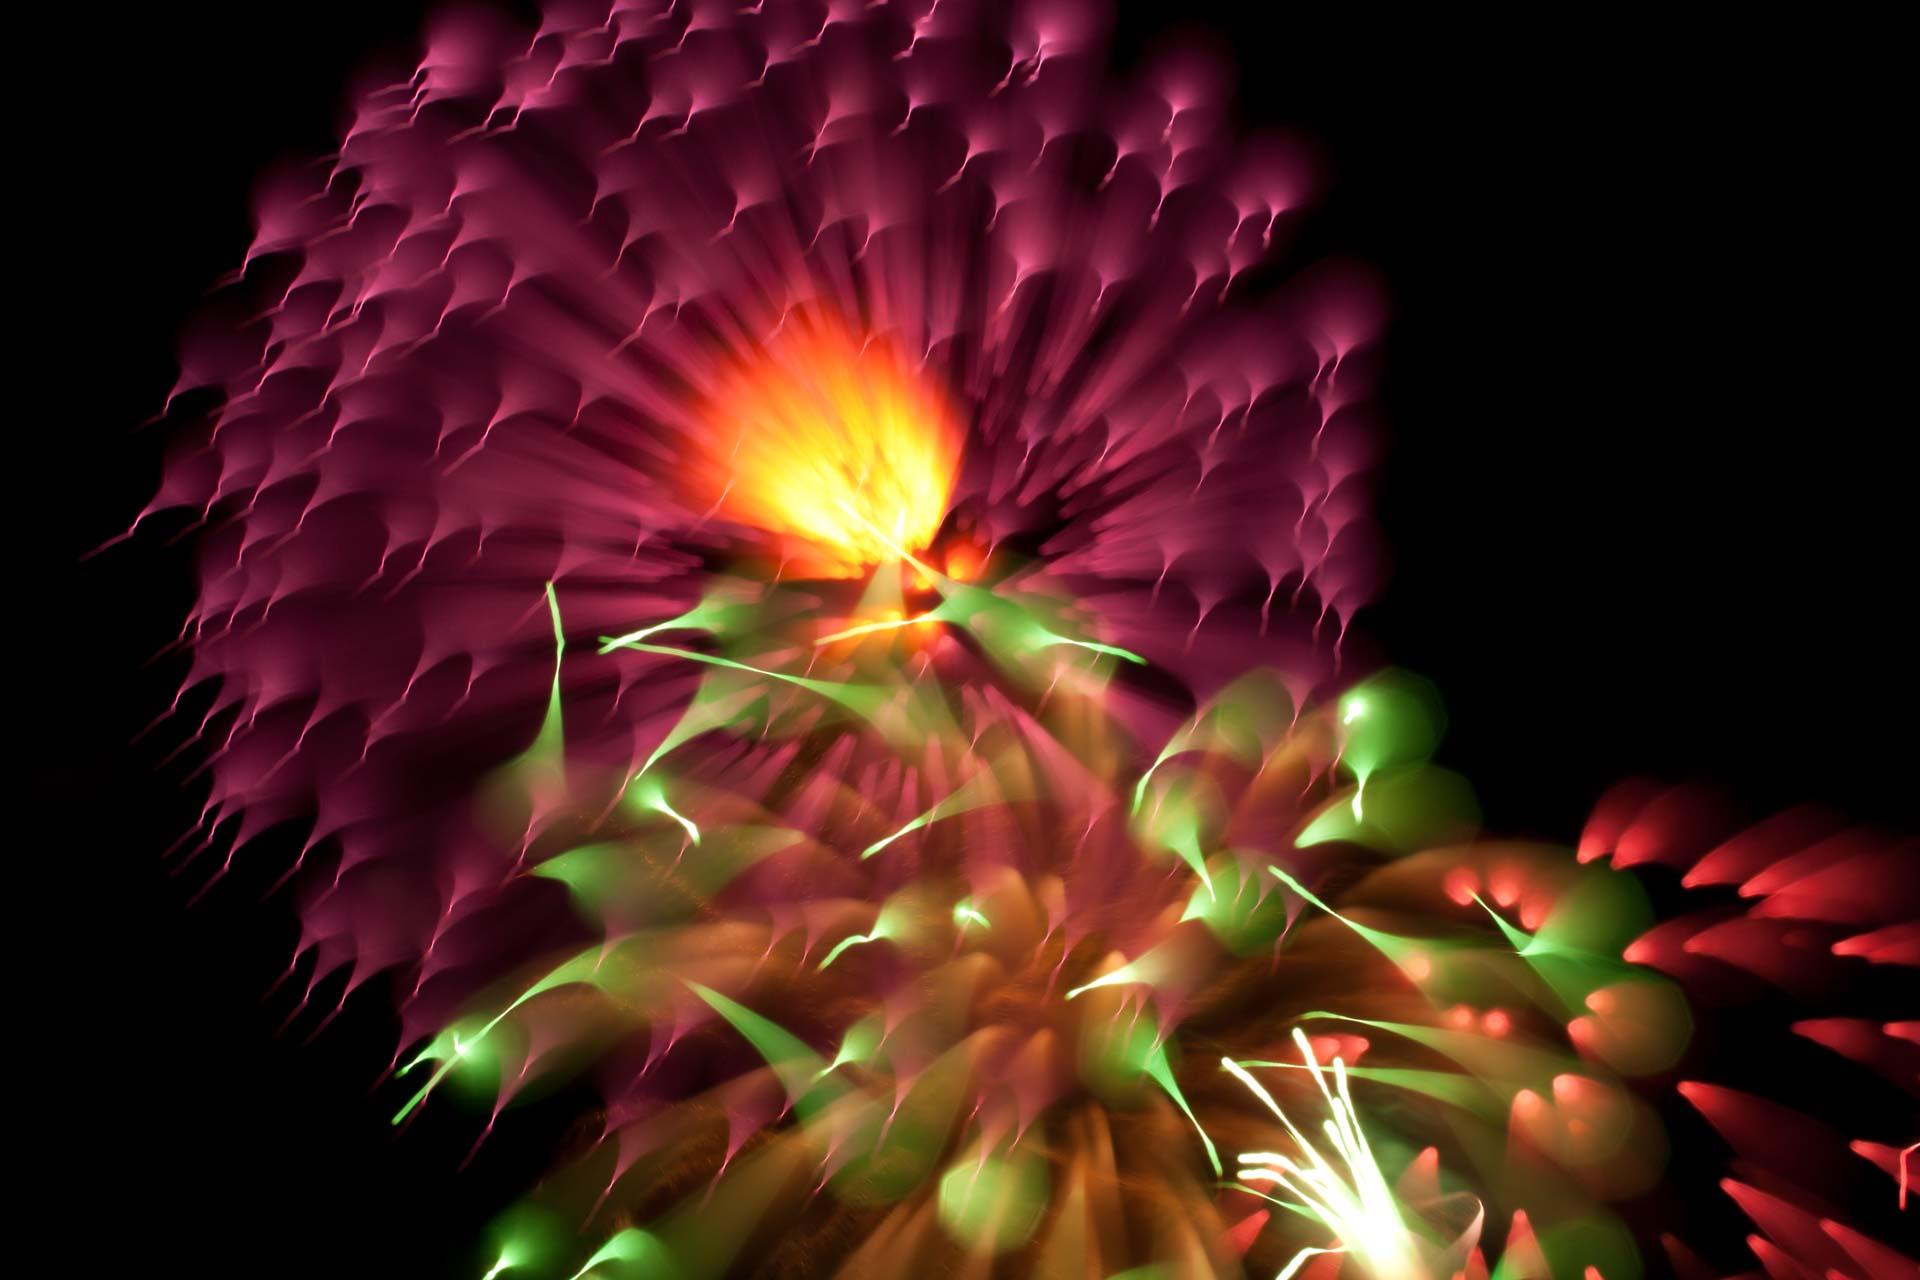 Fireworks - July 4 2016